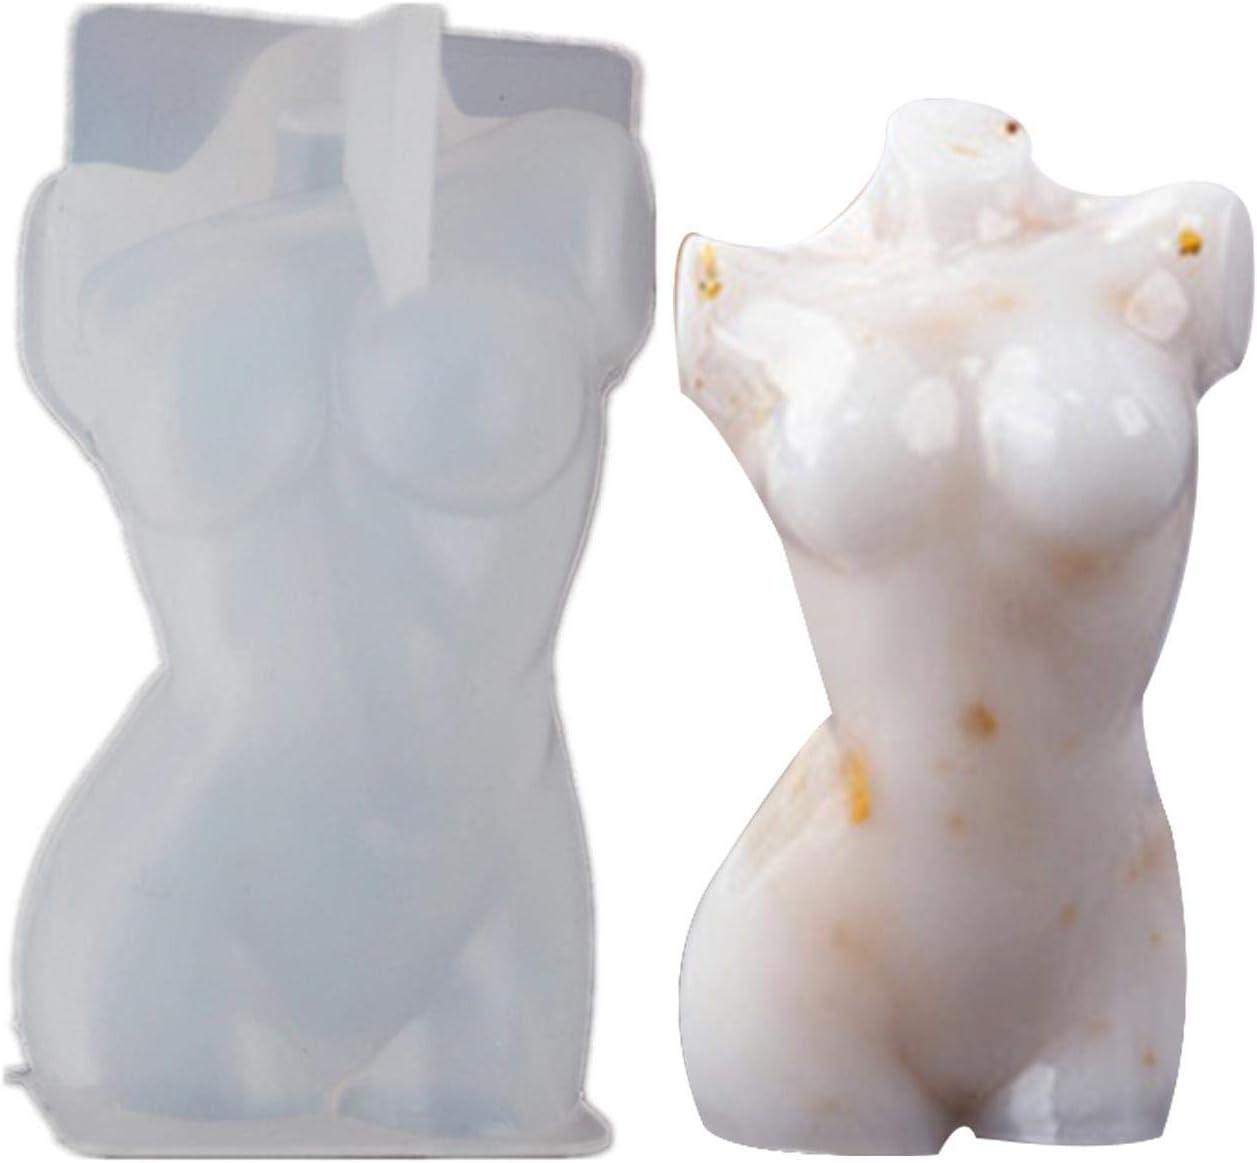 Forma Irregular /Única 3D Silicona Molde De Vela De Cuerpo Mujer Awayhall Moldes para Velas Molde De Jab/ón De Diosa De Venus para Adorno De Velas De Bricolaje